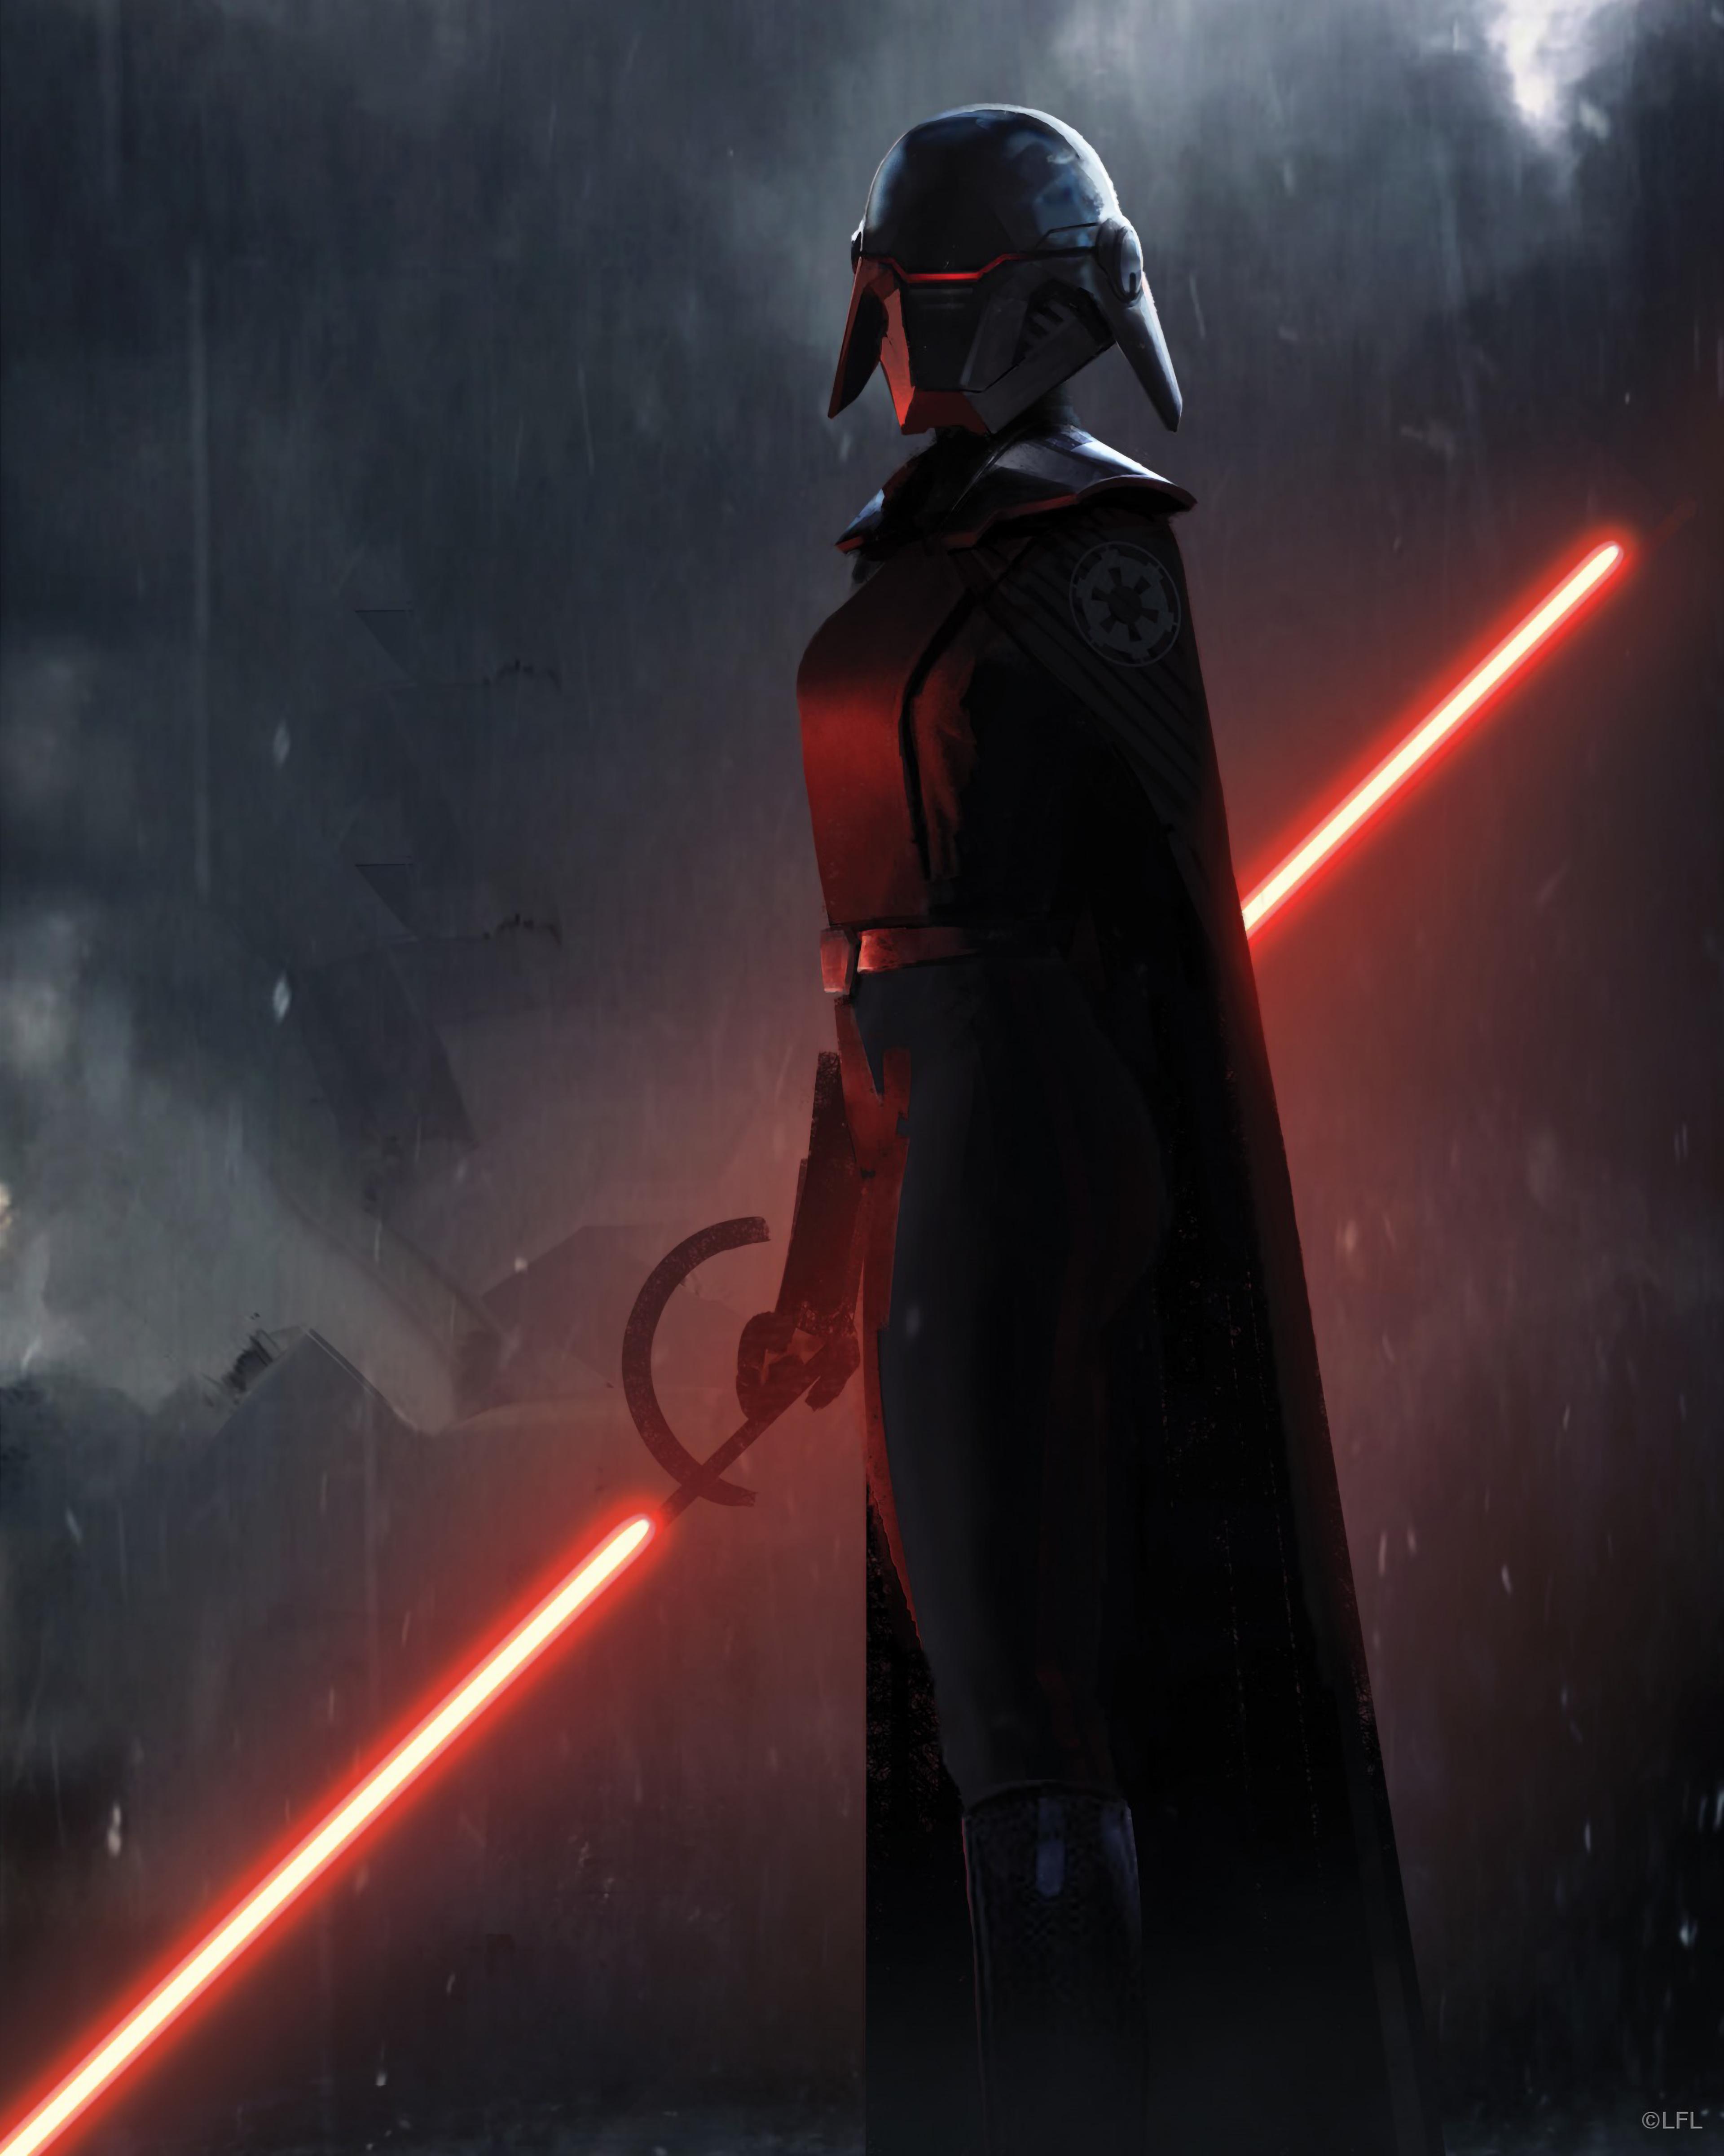 Second Sister Star Wars Jedi Fallen Order Wallpaper Hd Games 4k